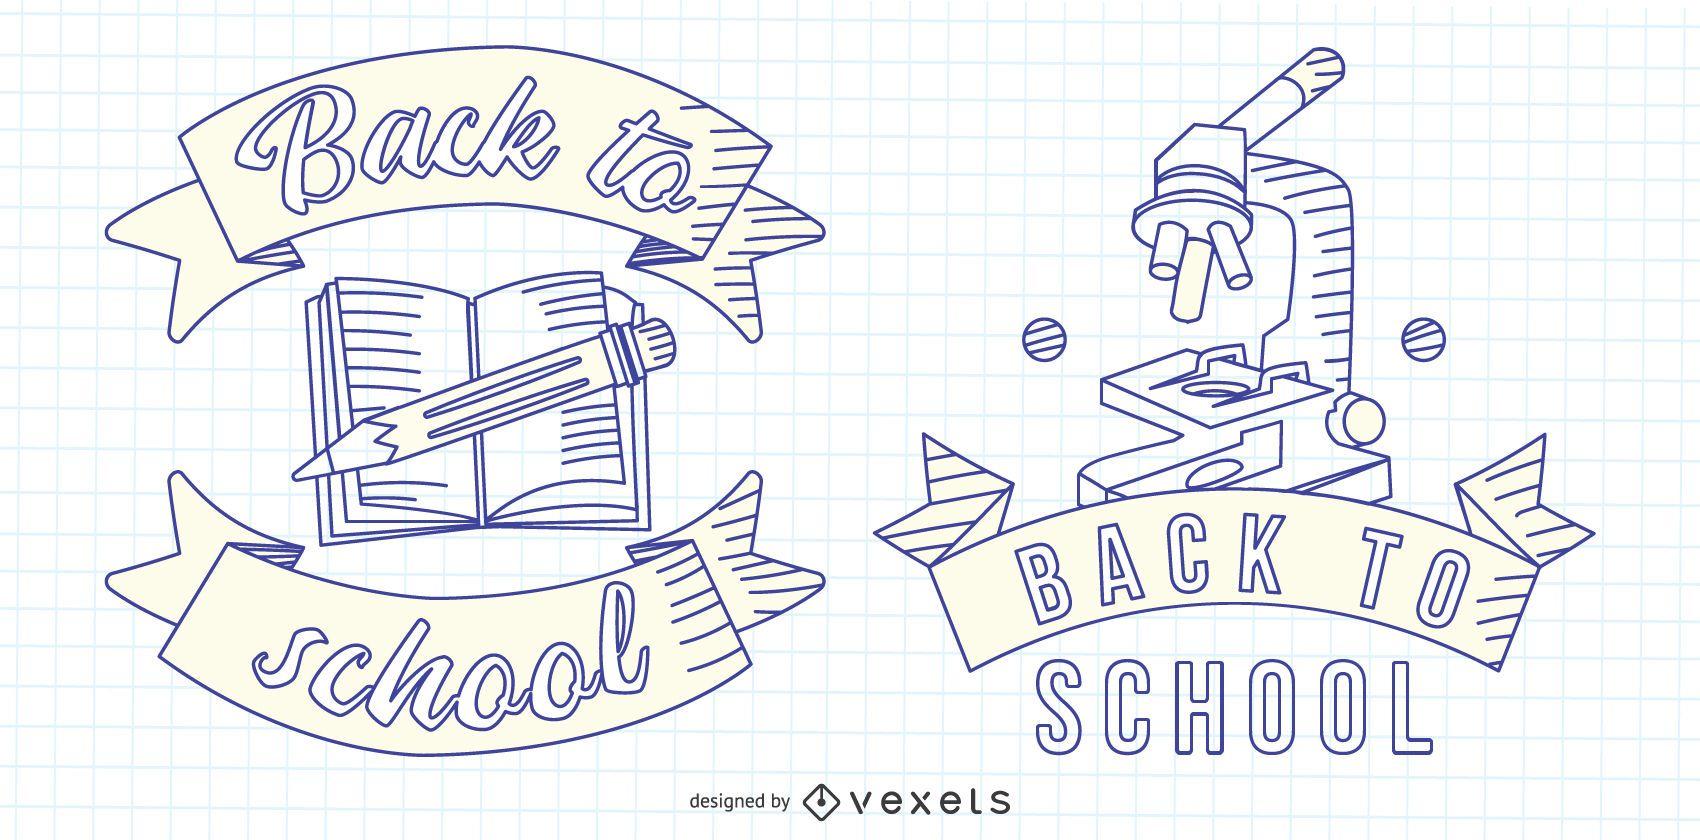 Emblema de la l?nea de regreso a la escuela